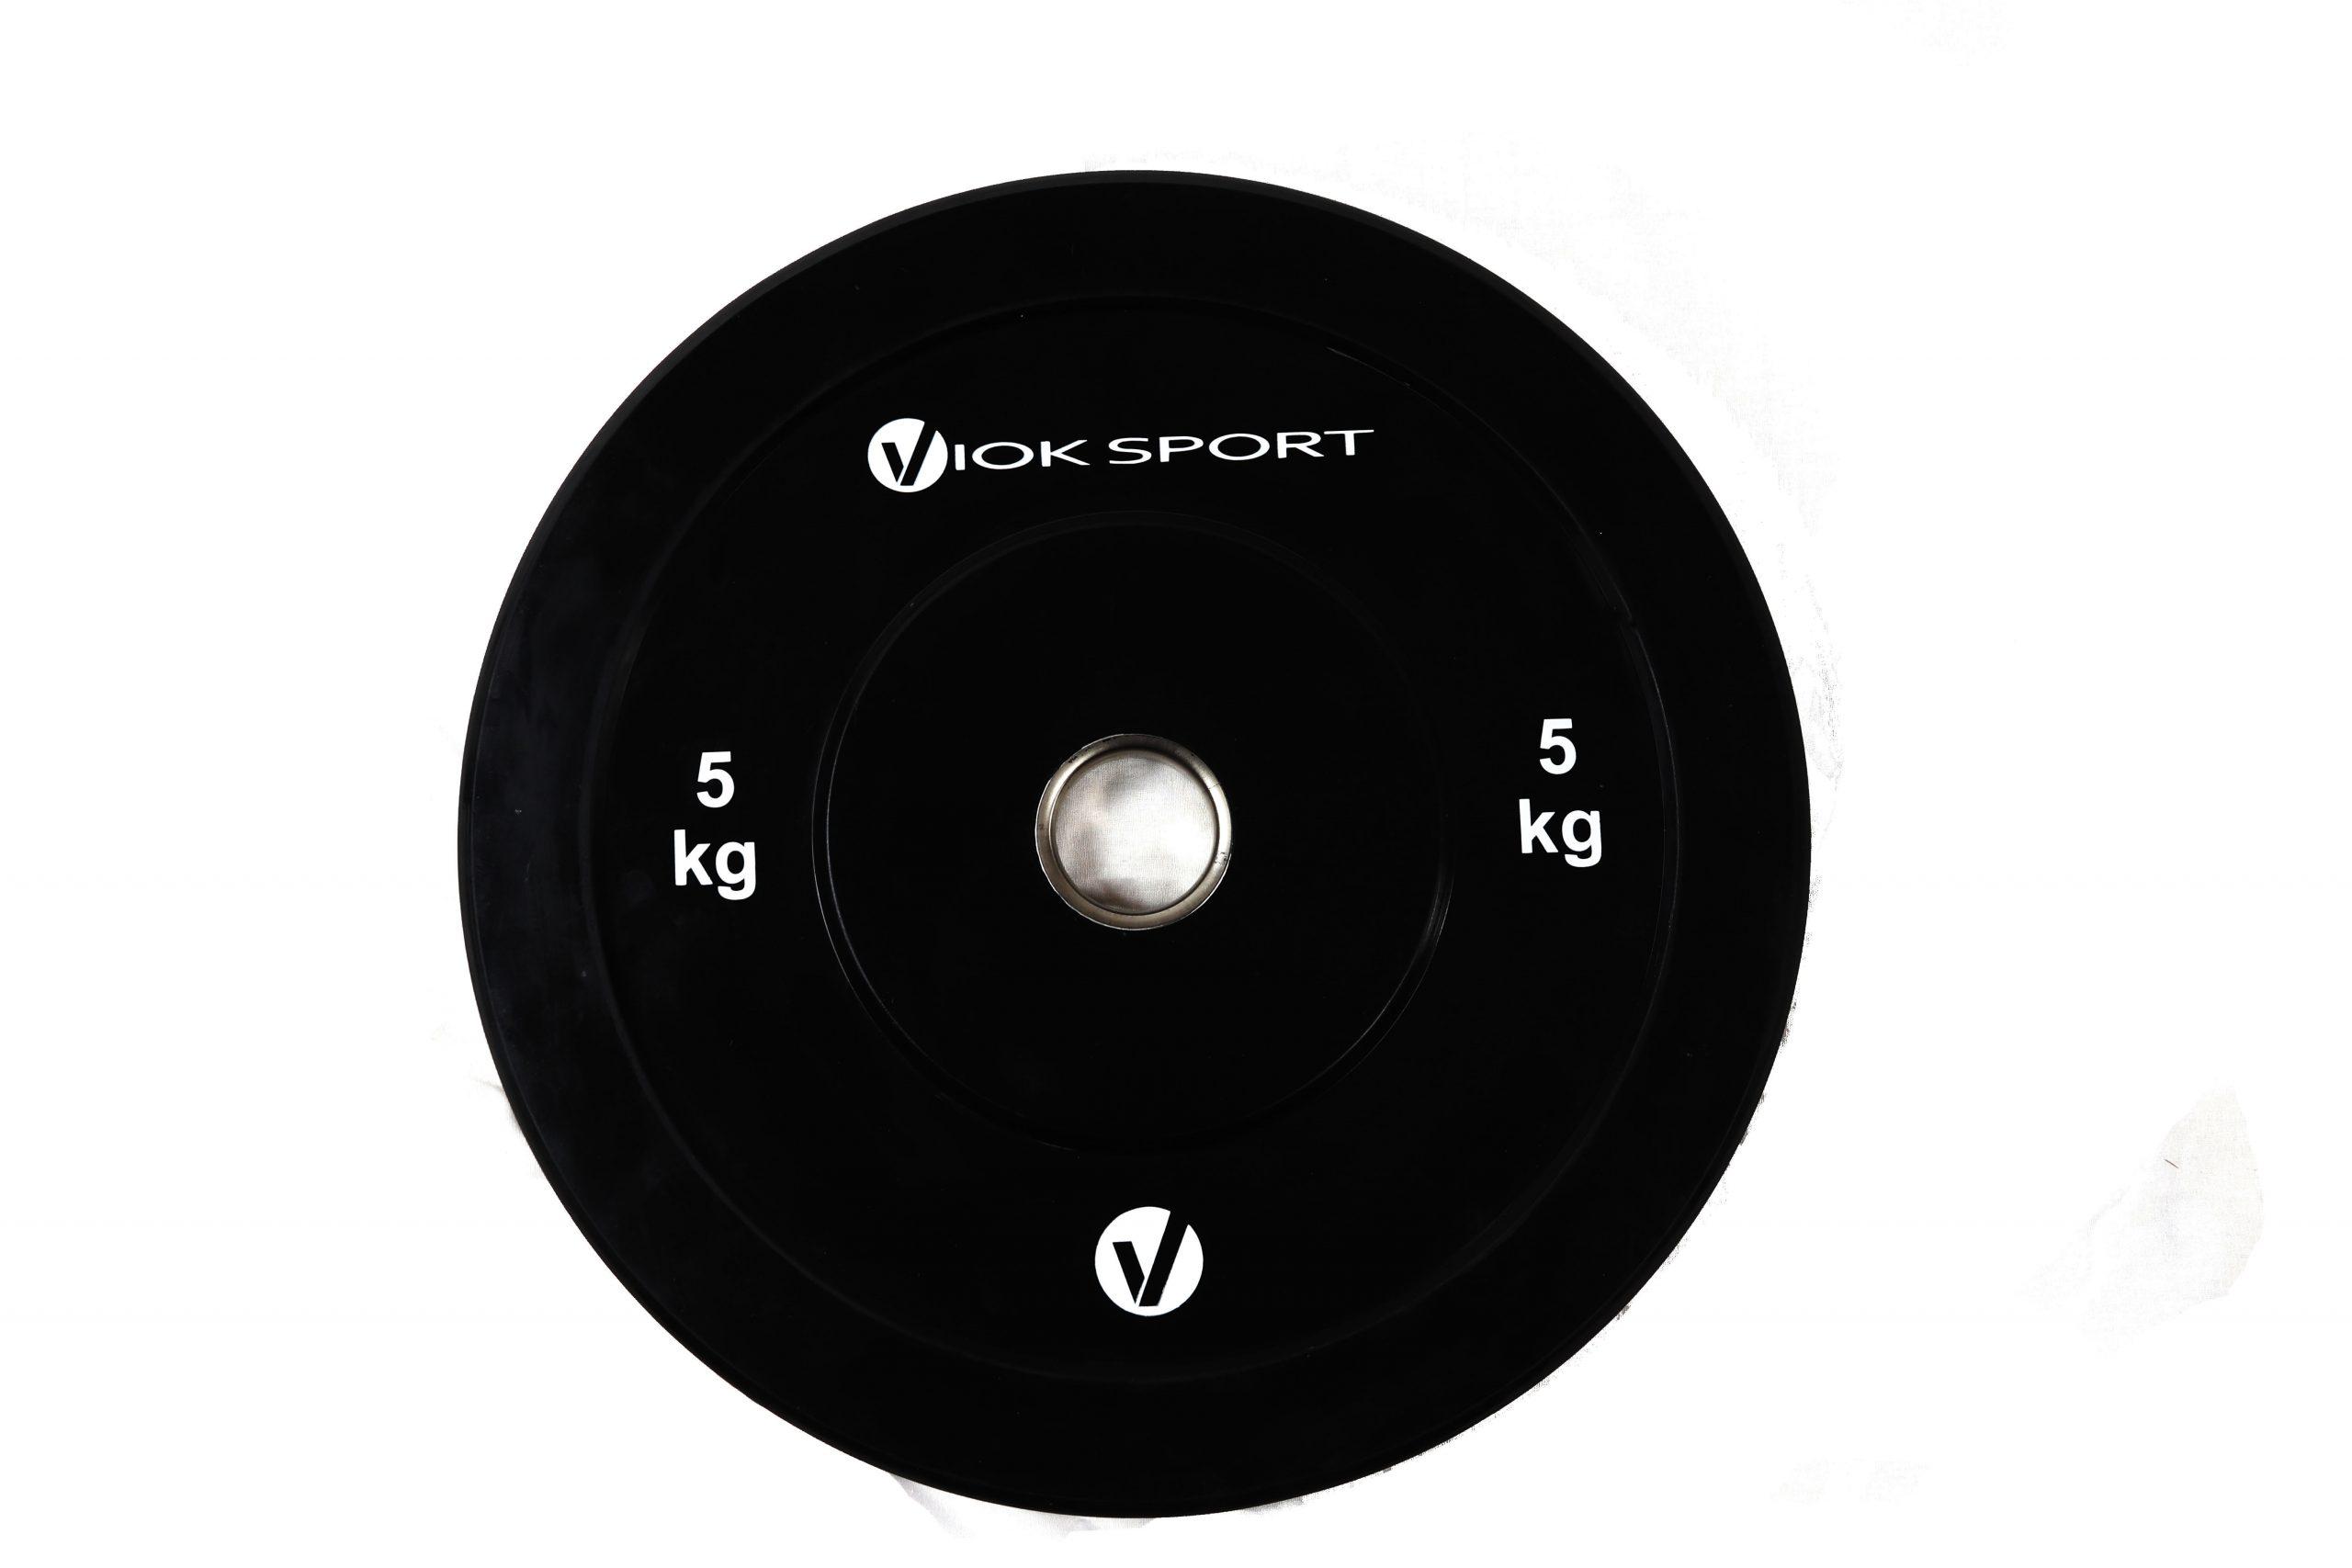 Disco olímpico bumper negro de halterofilia 5 a 25 kg